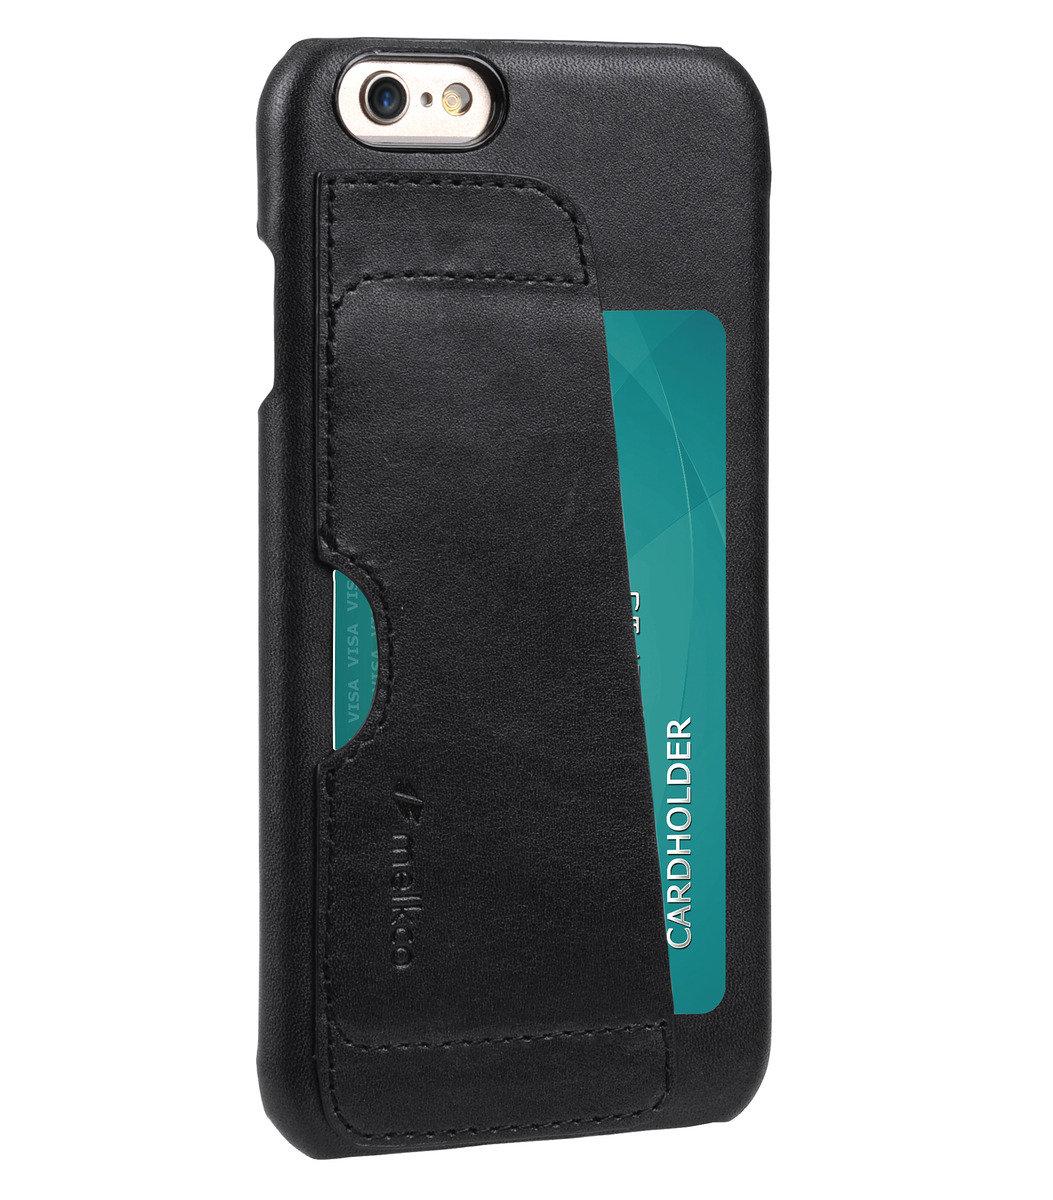 Apple iPhone 6S Plus (5.5 inch) European系列高級真皮革手機套 - 黑色